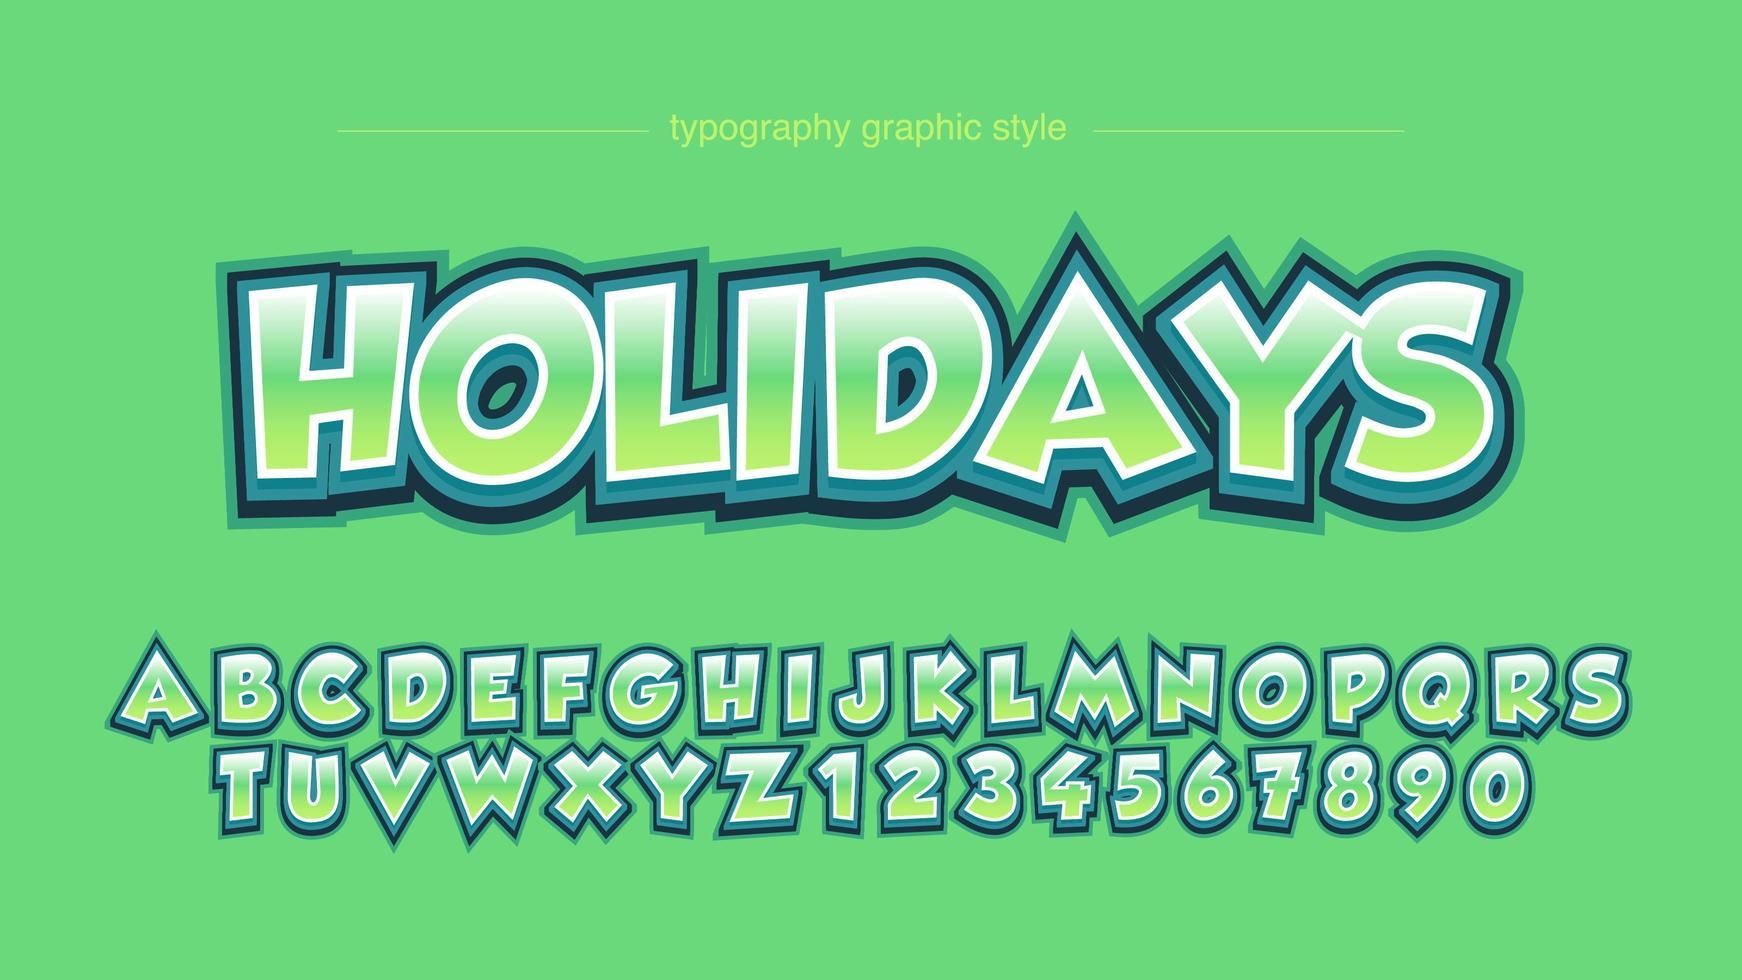 grön fet fet tecknad filmtecknad typografi vektor